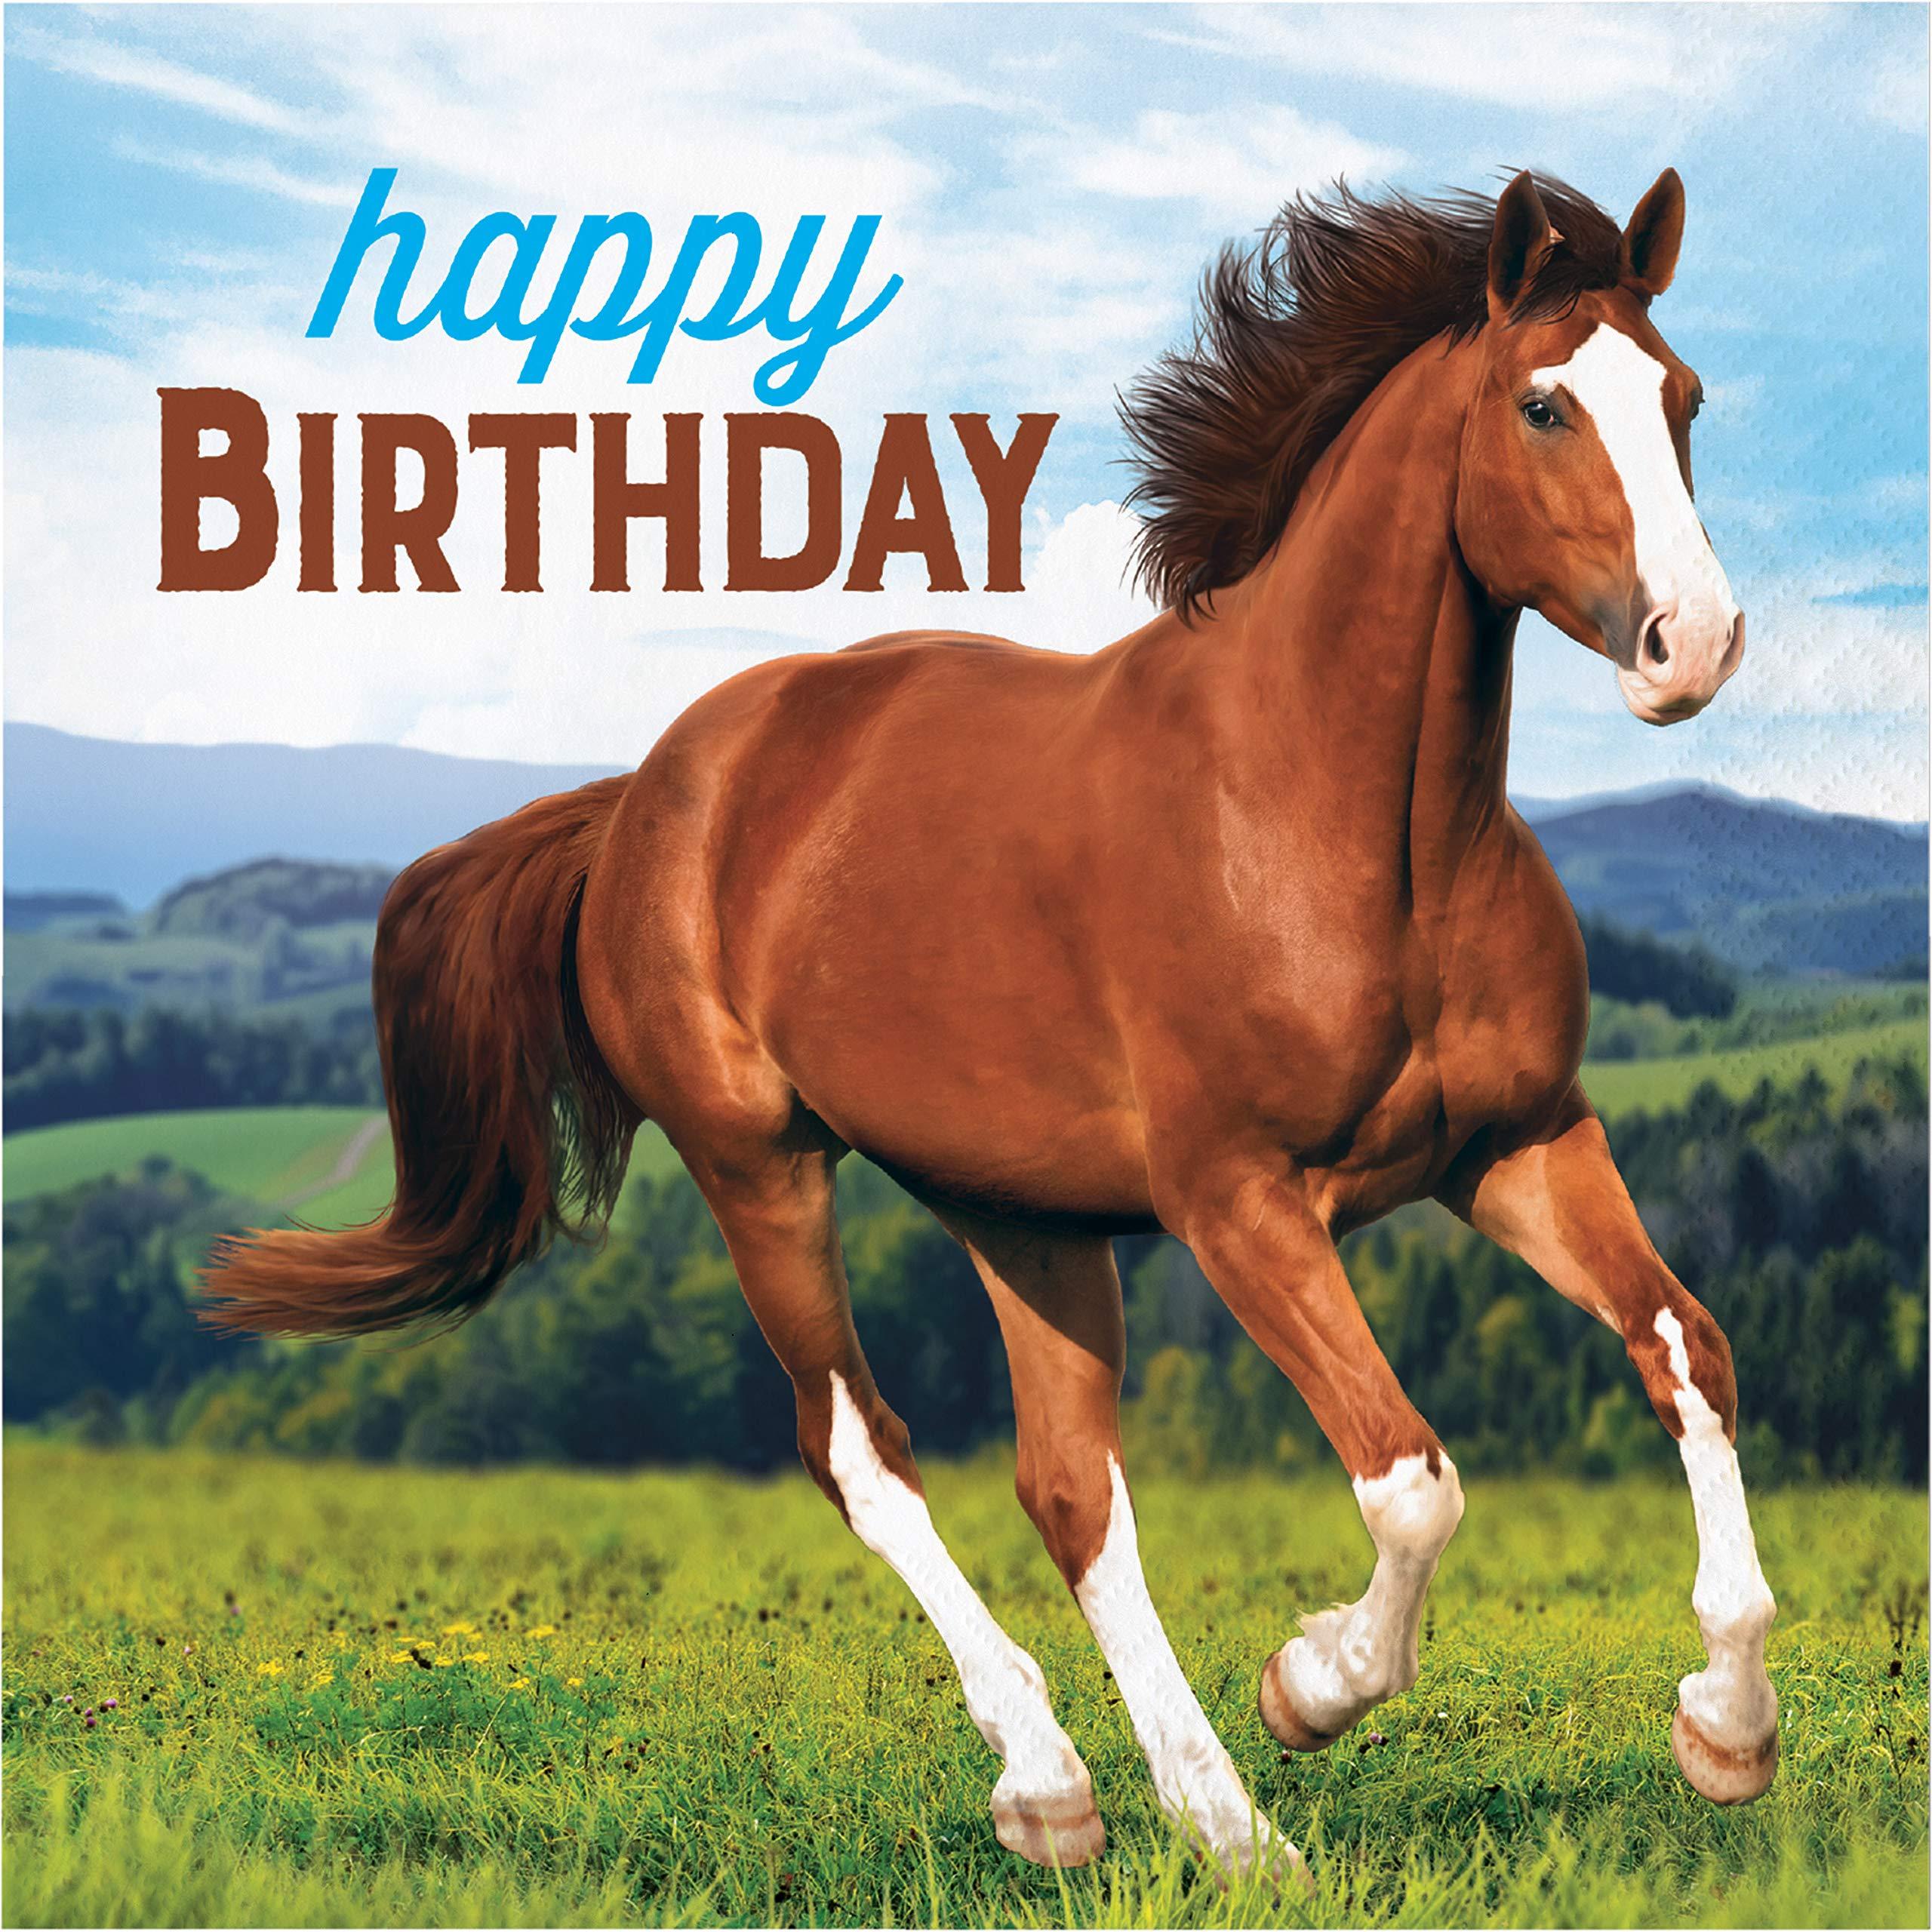 Wild Horse Happy Birthday Napkins, 48 ct by Creative Converting